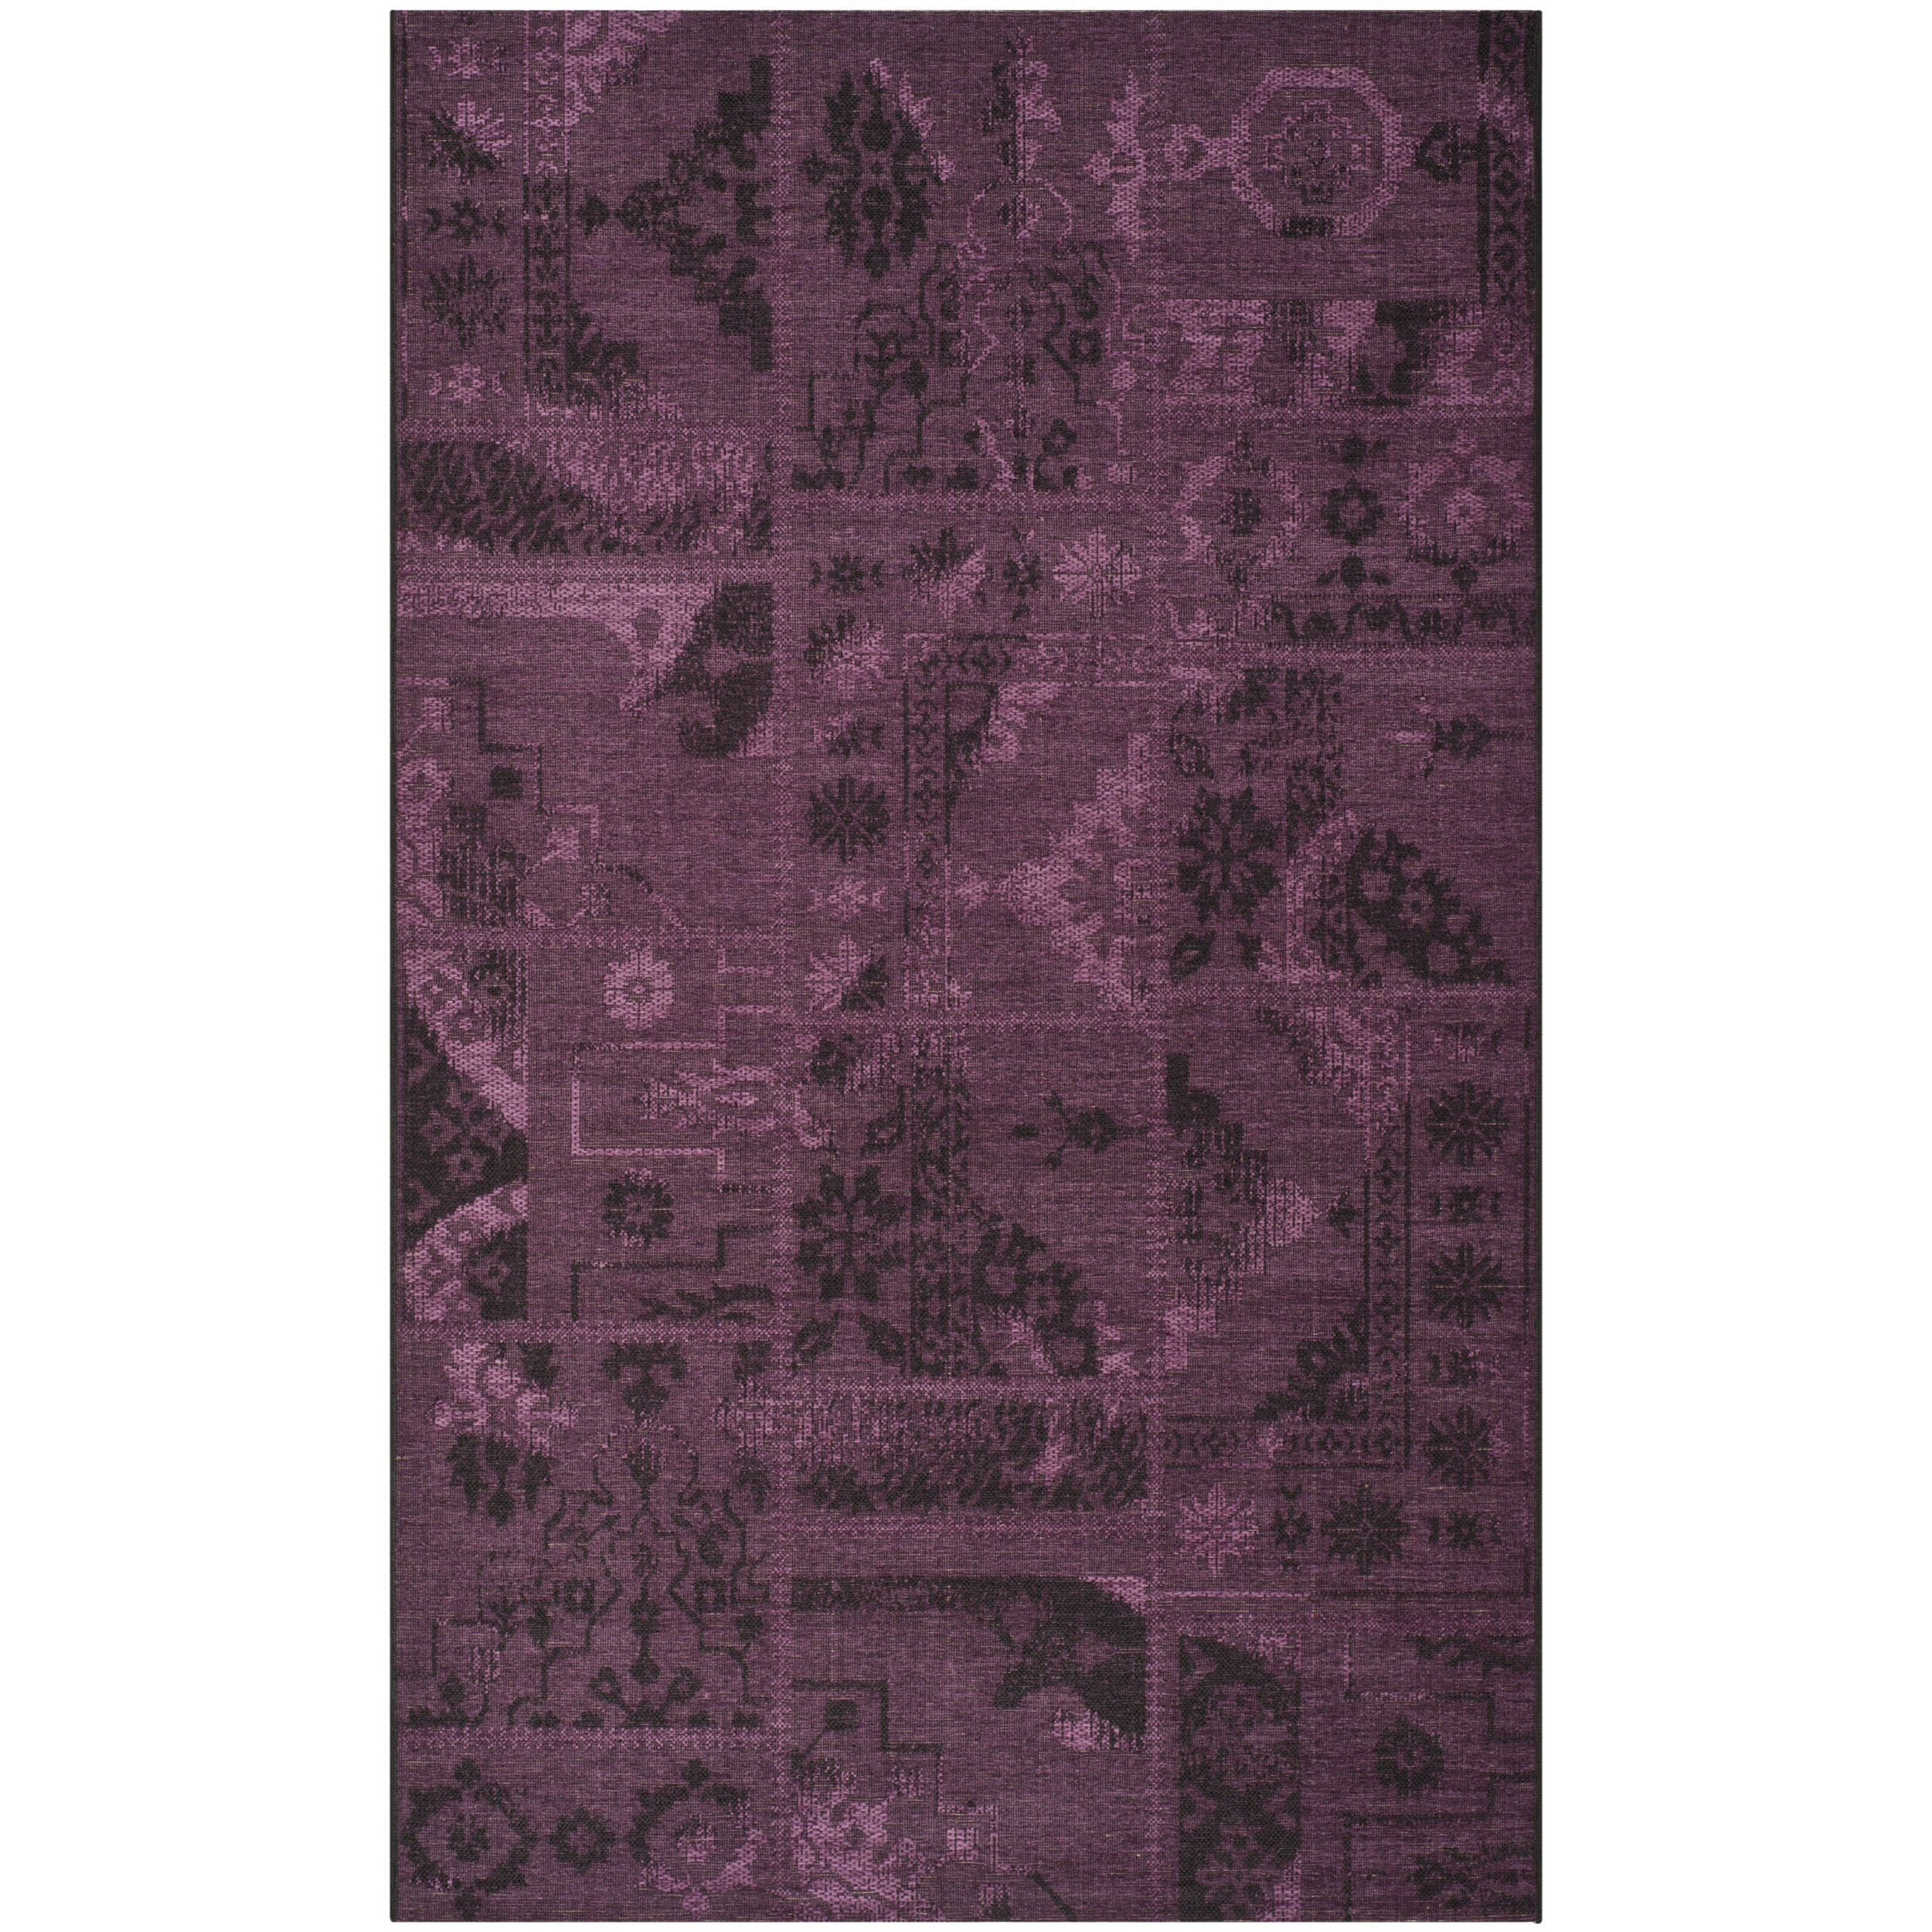 Safavieh Palazzo Collection PAL121-56C7 Black and Purple Area Rug (5' x 8')